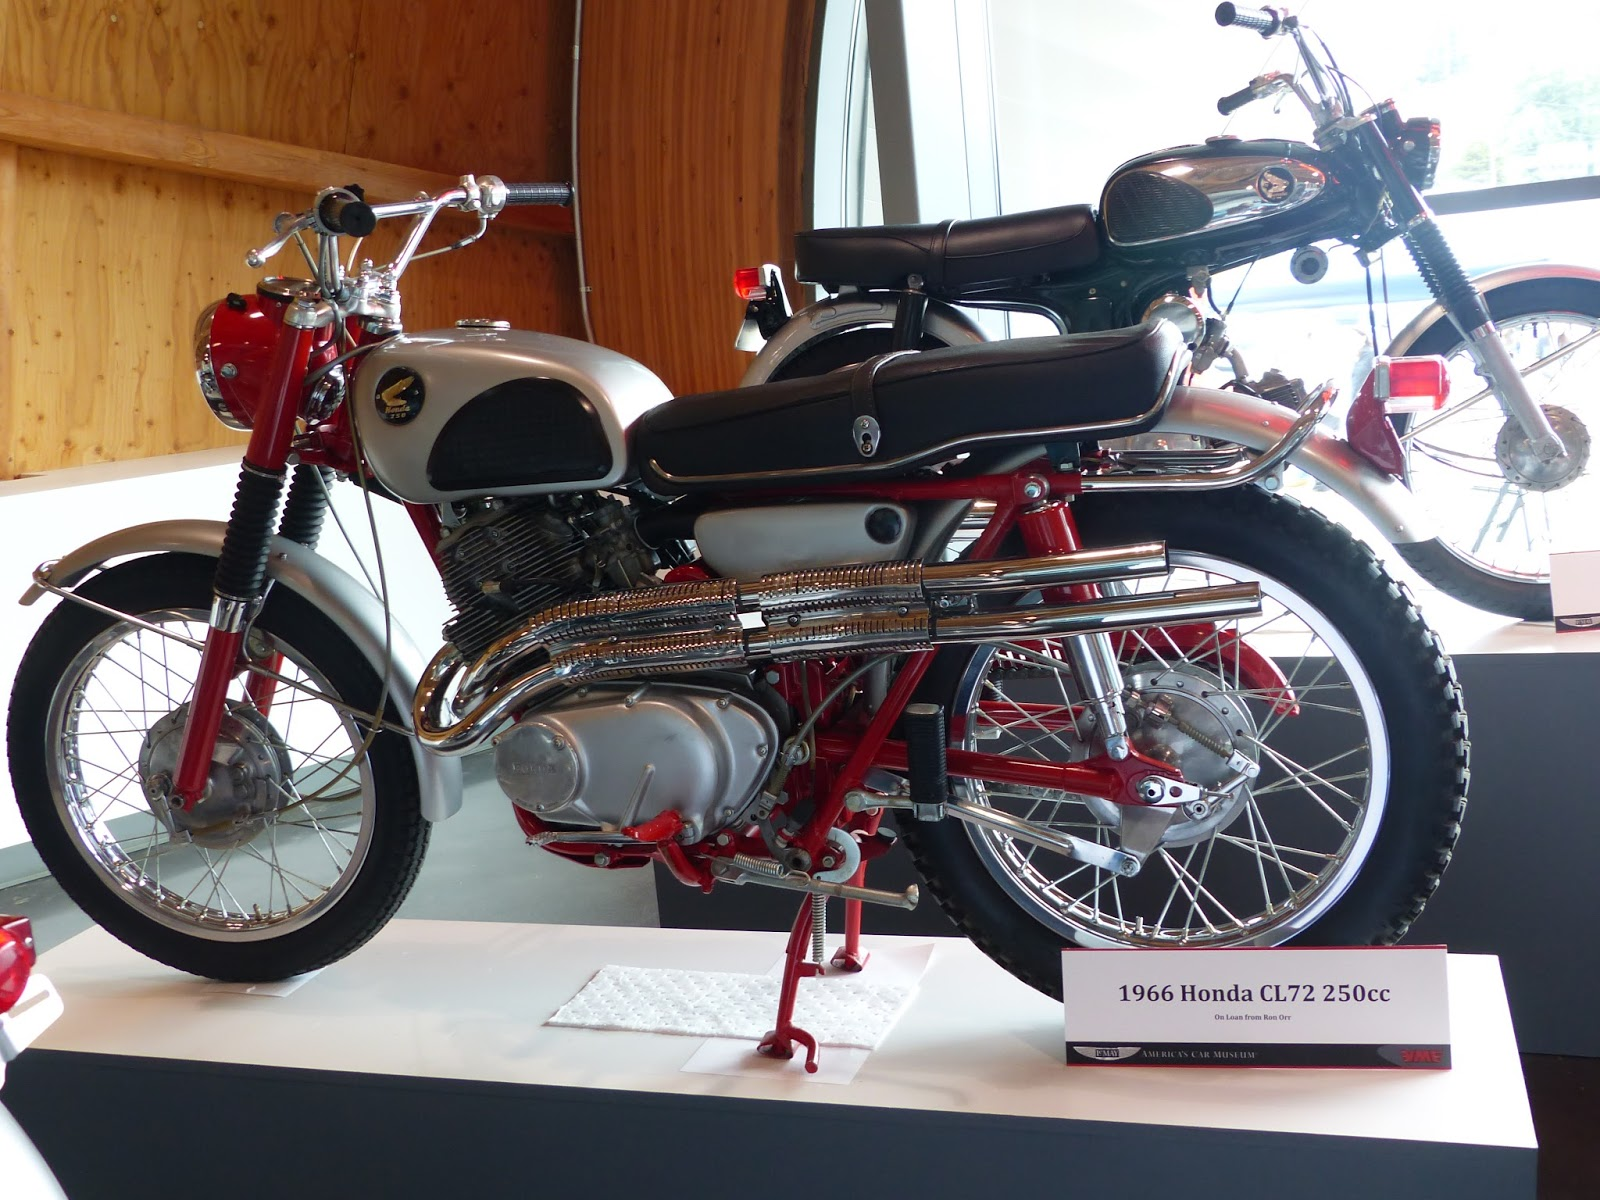 Honda Cl72 Exhaust Pipe T Wiring 1966 250cc Scrambler On Display At Lemay Americas Car Museum Tacoma Wa